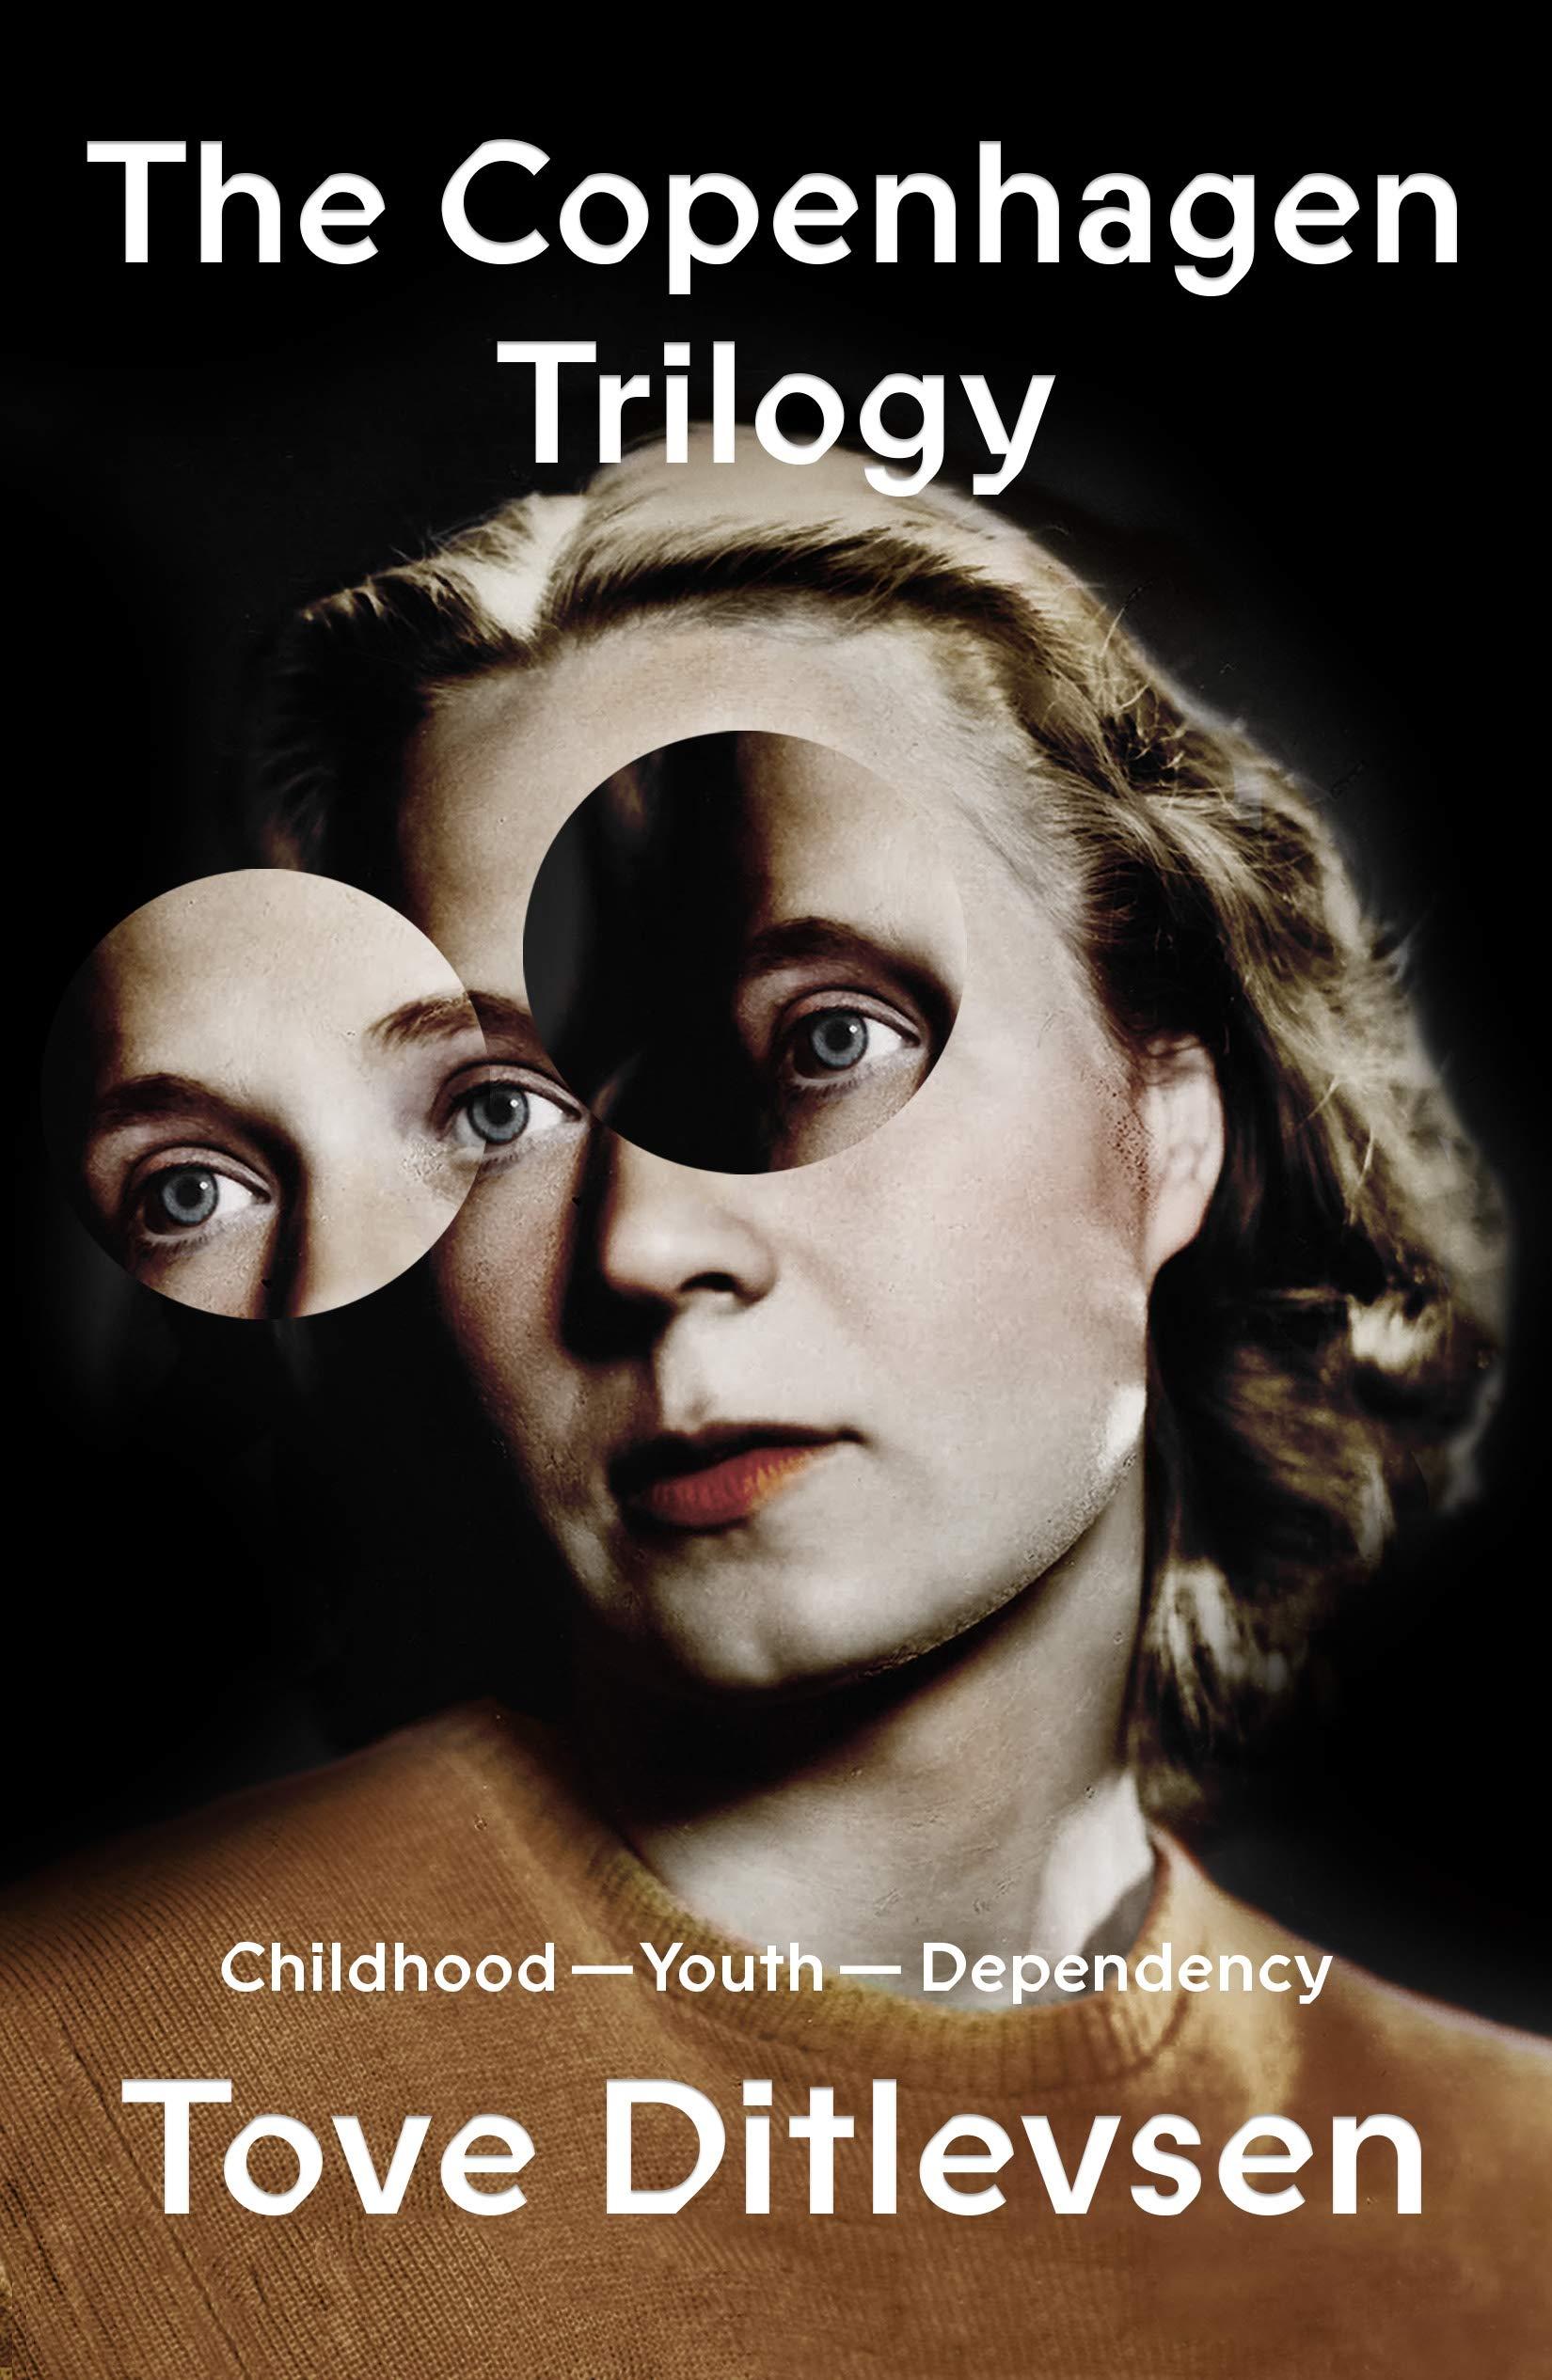 Tove Ditlevsen, tr. Tiina Nunnally and Michael Favala Goldman, The Copenhagen Trilogy